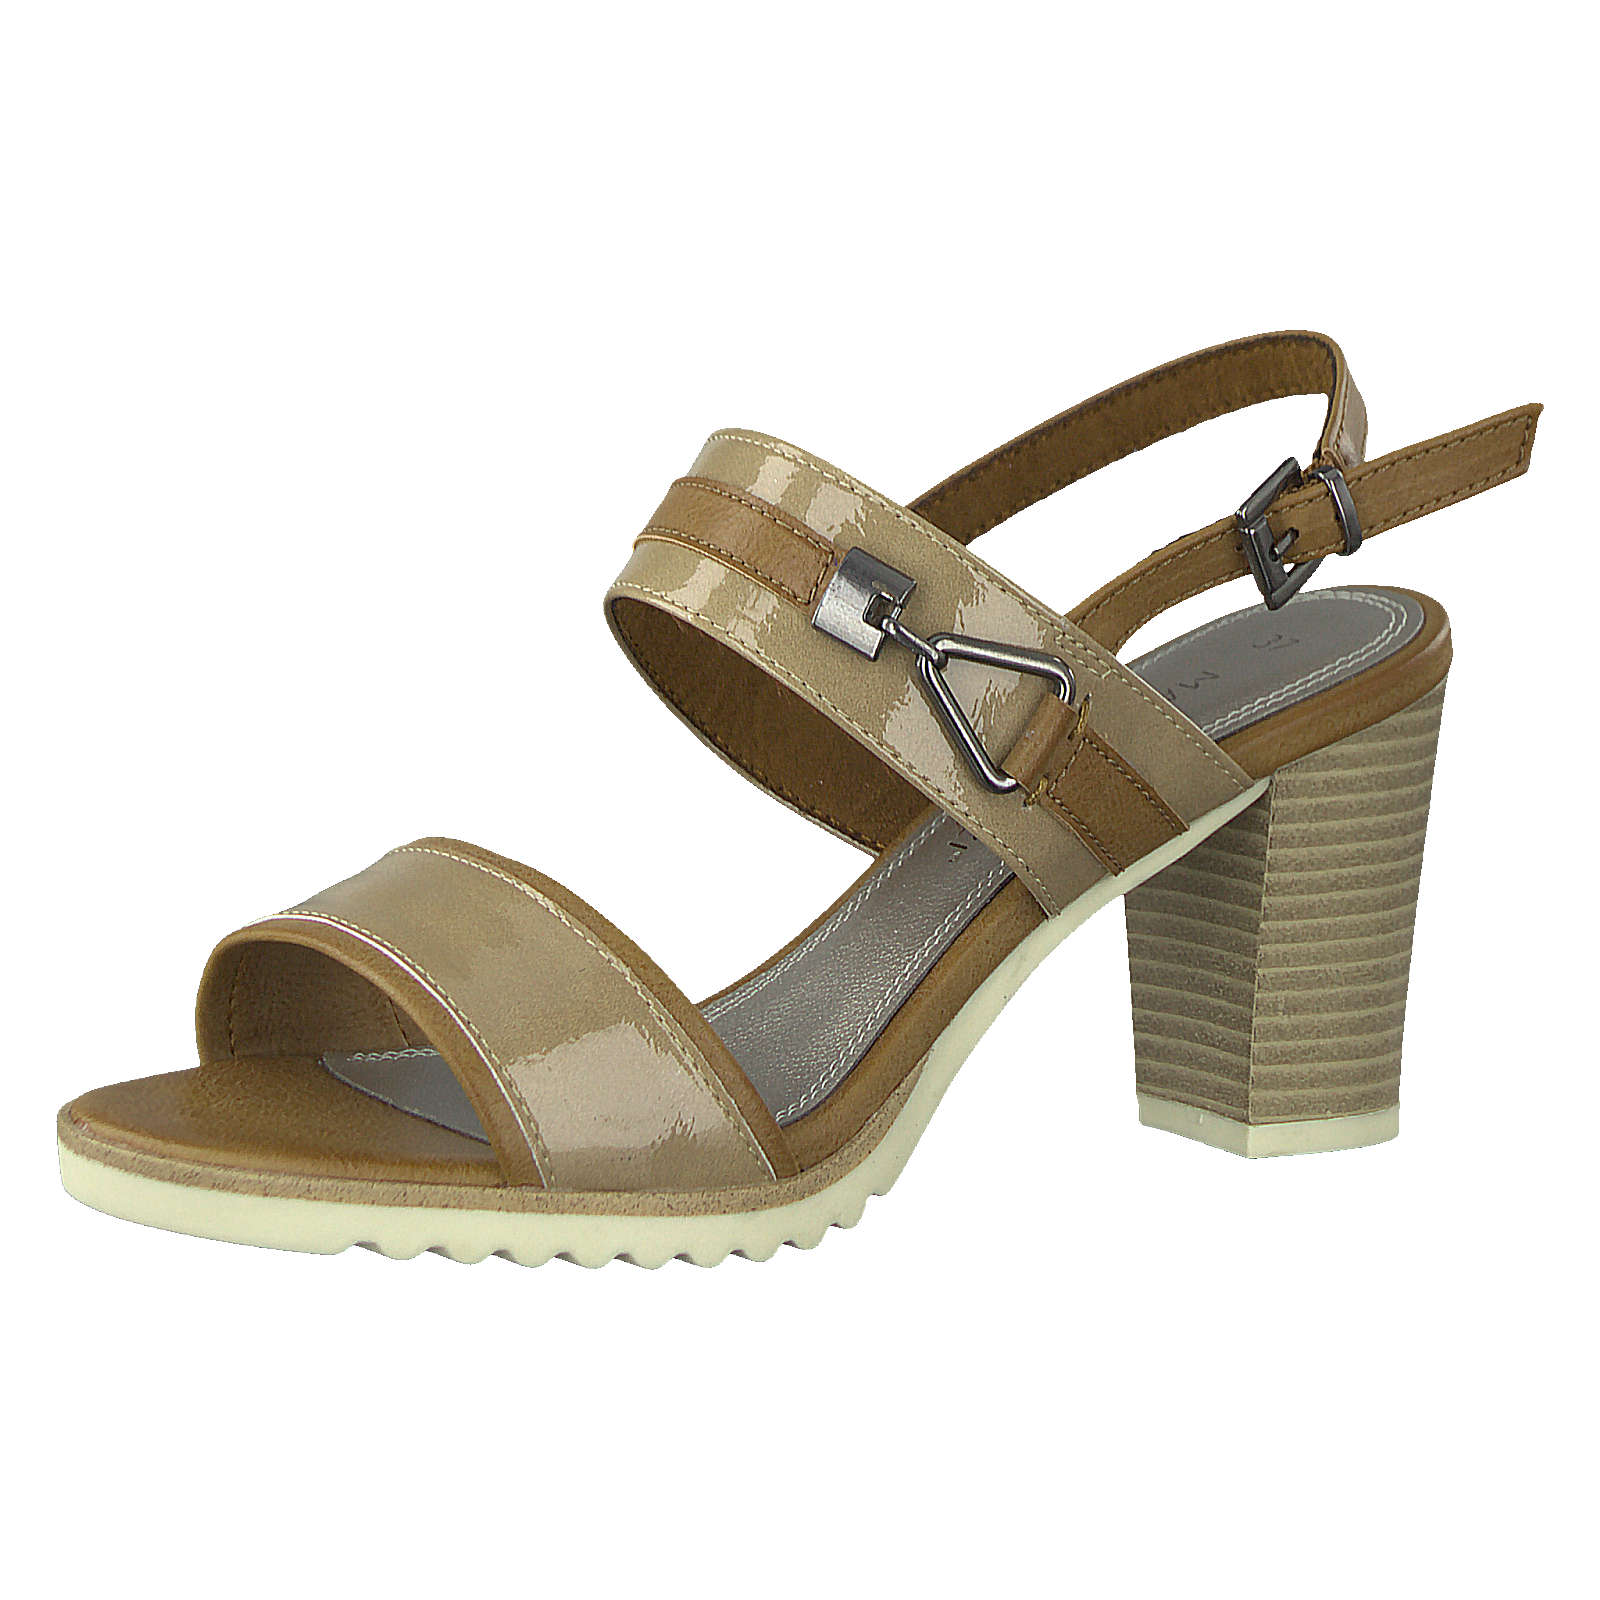 MARCO TOZZI Klassische Sandaletten gold Damen Gr. 41